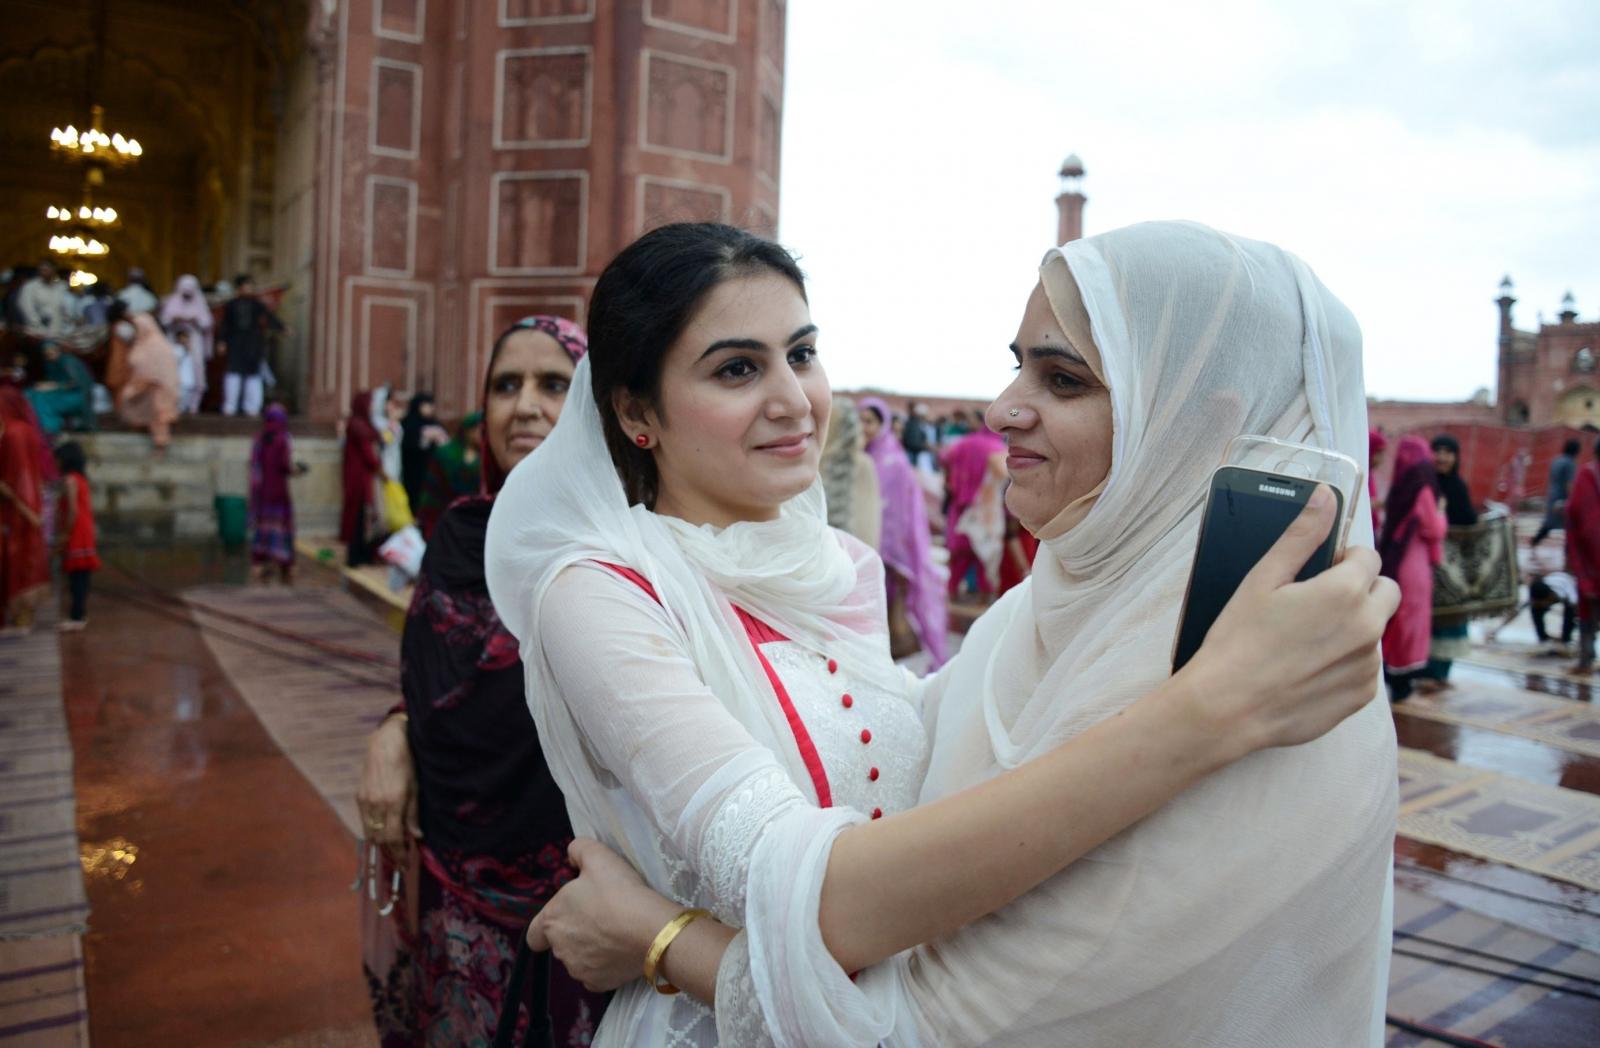 Most Inspiring Celebration Eid Al-Fitr Feast - eid-al-fitr  Pic_49737 .jpg